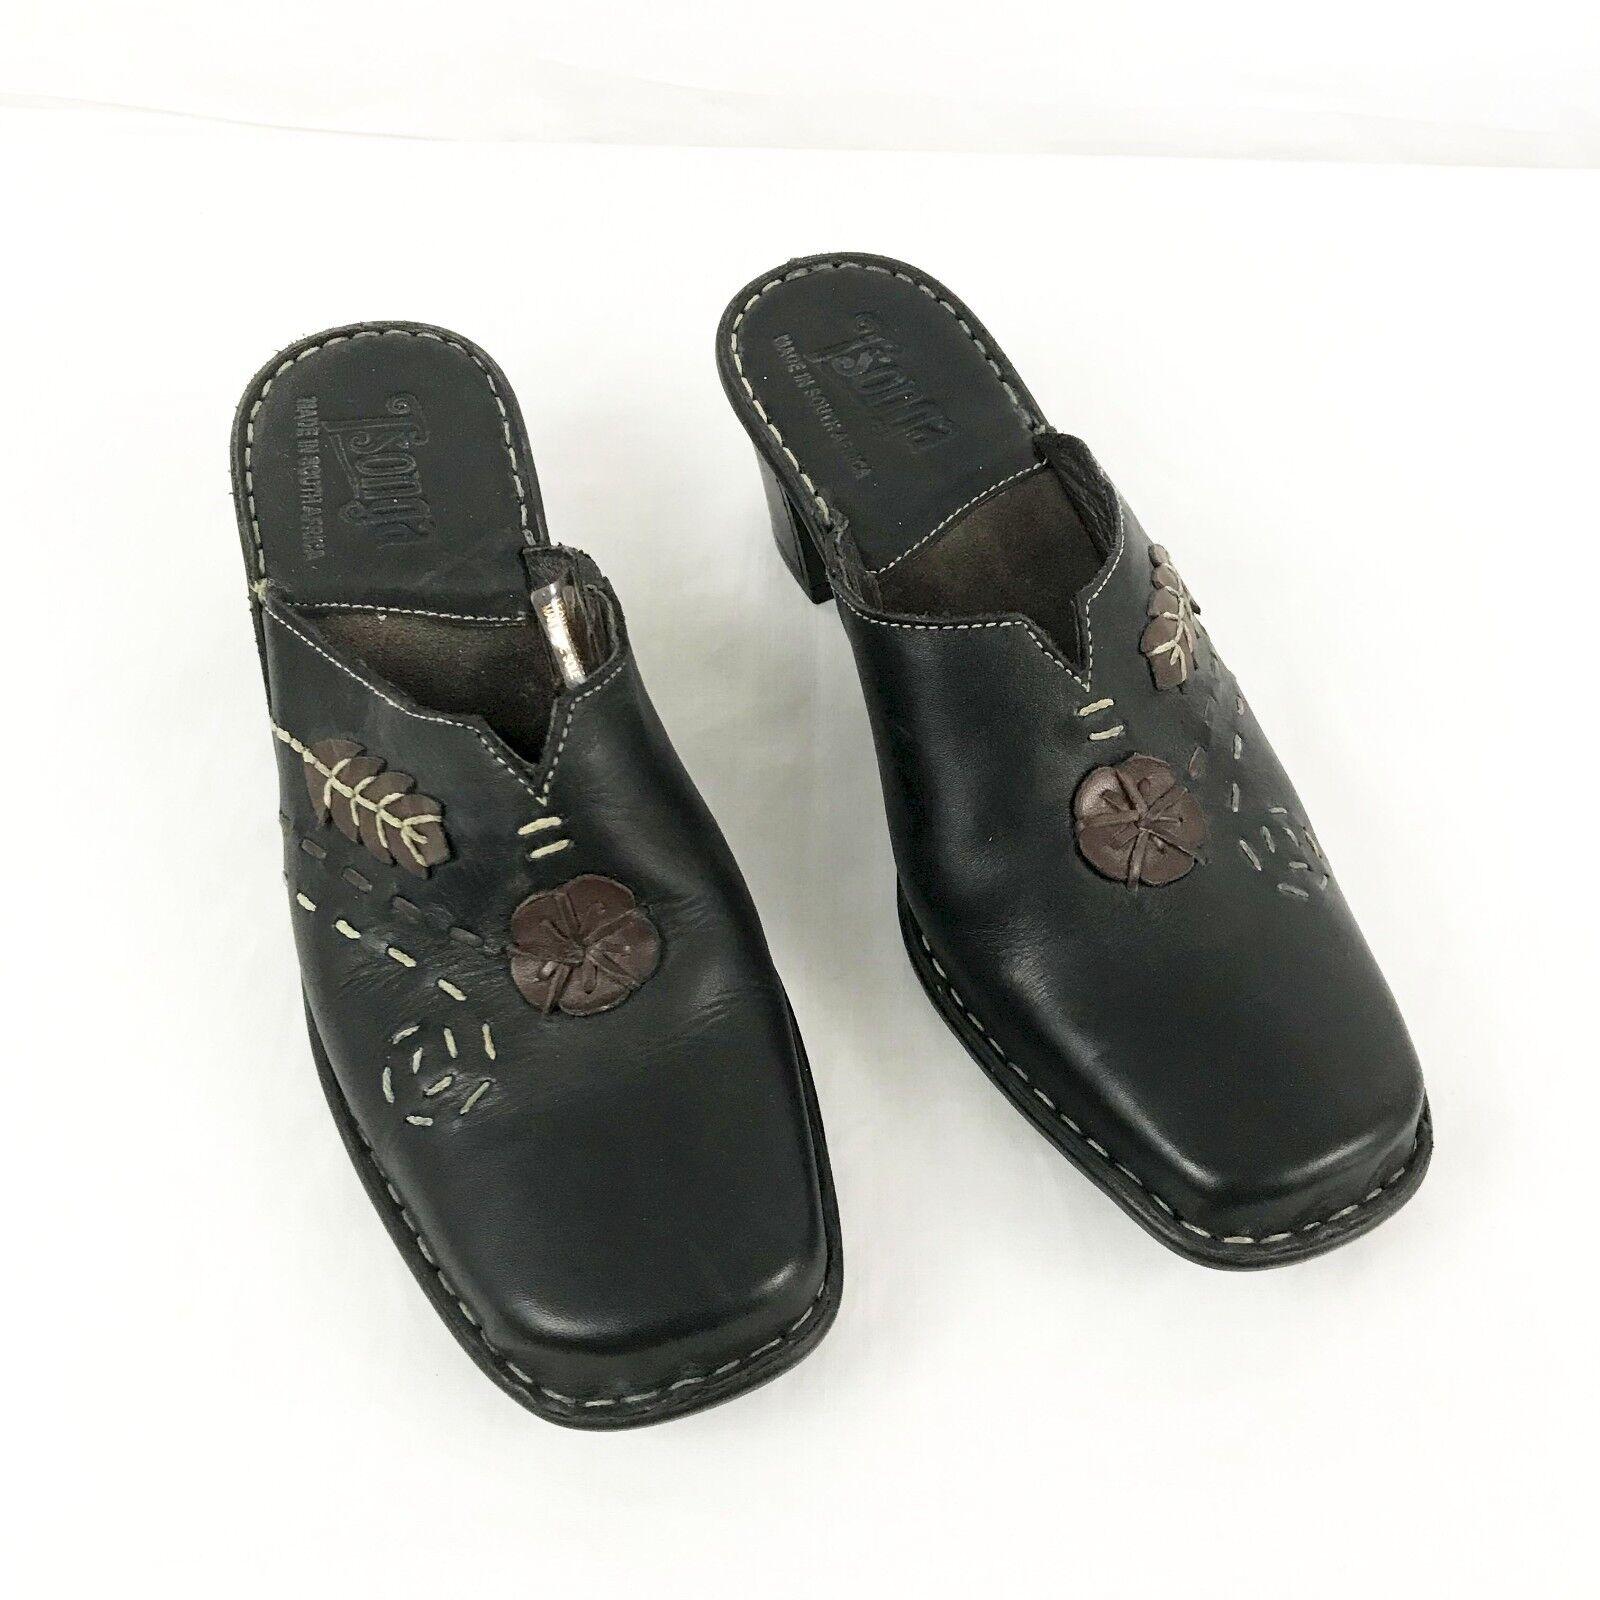 Tsonga Womens Mule Sz 8 M Slip On Leather Block Heel Embroidered Exposed Stitch